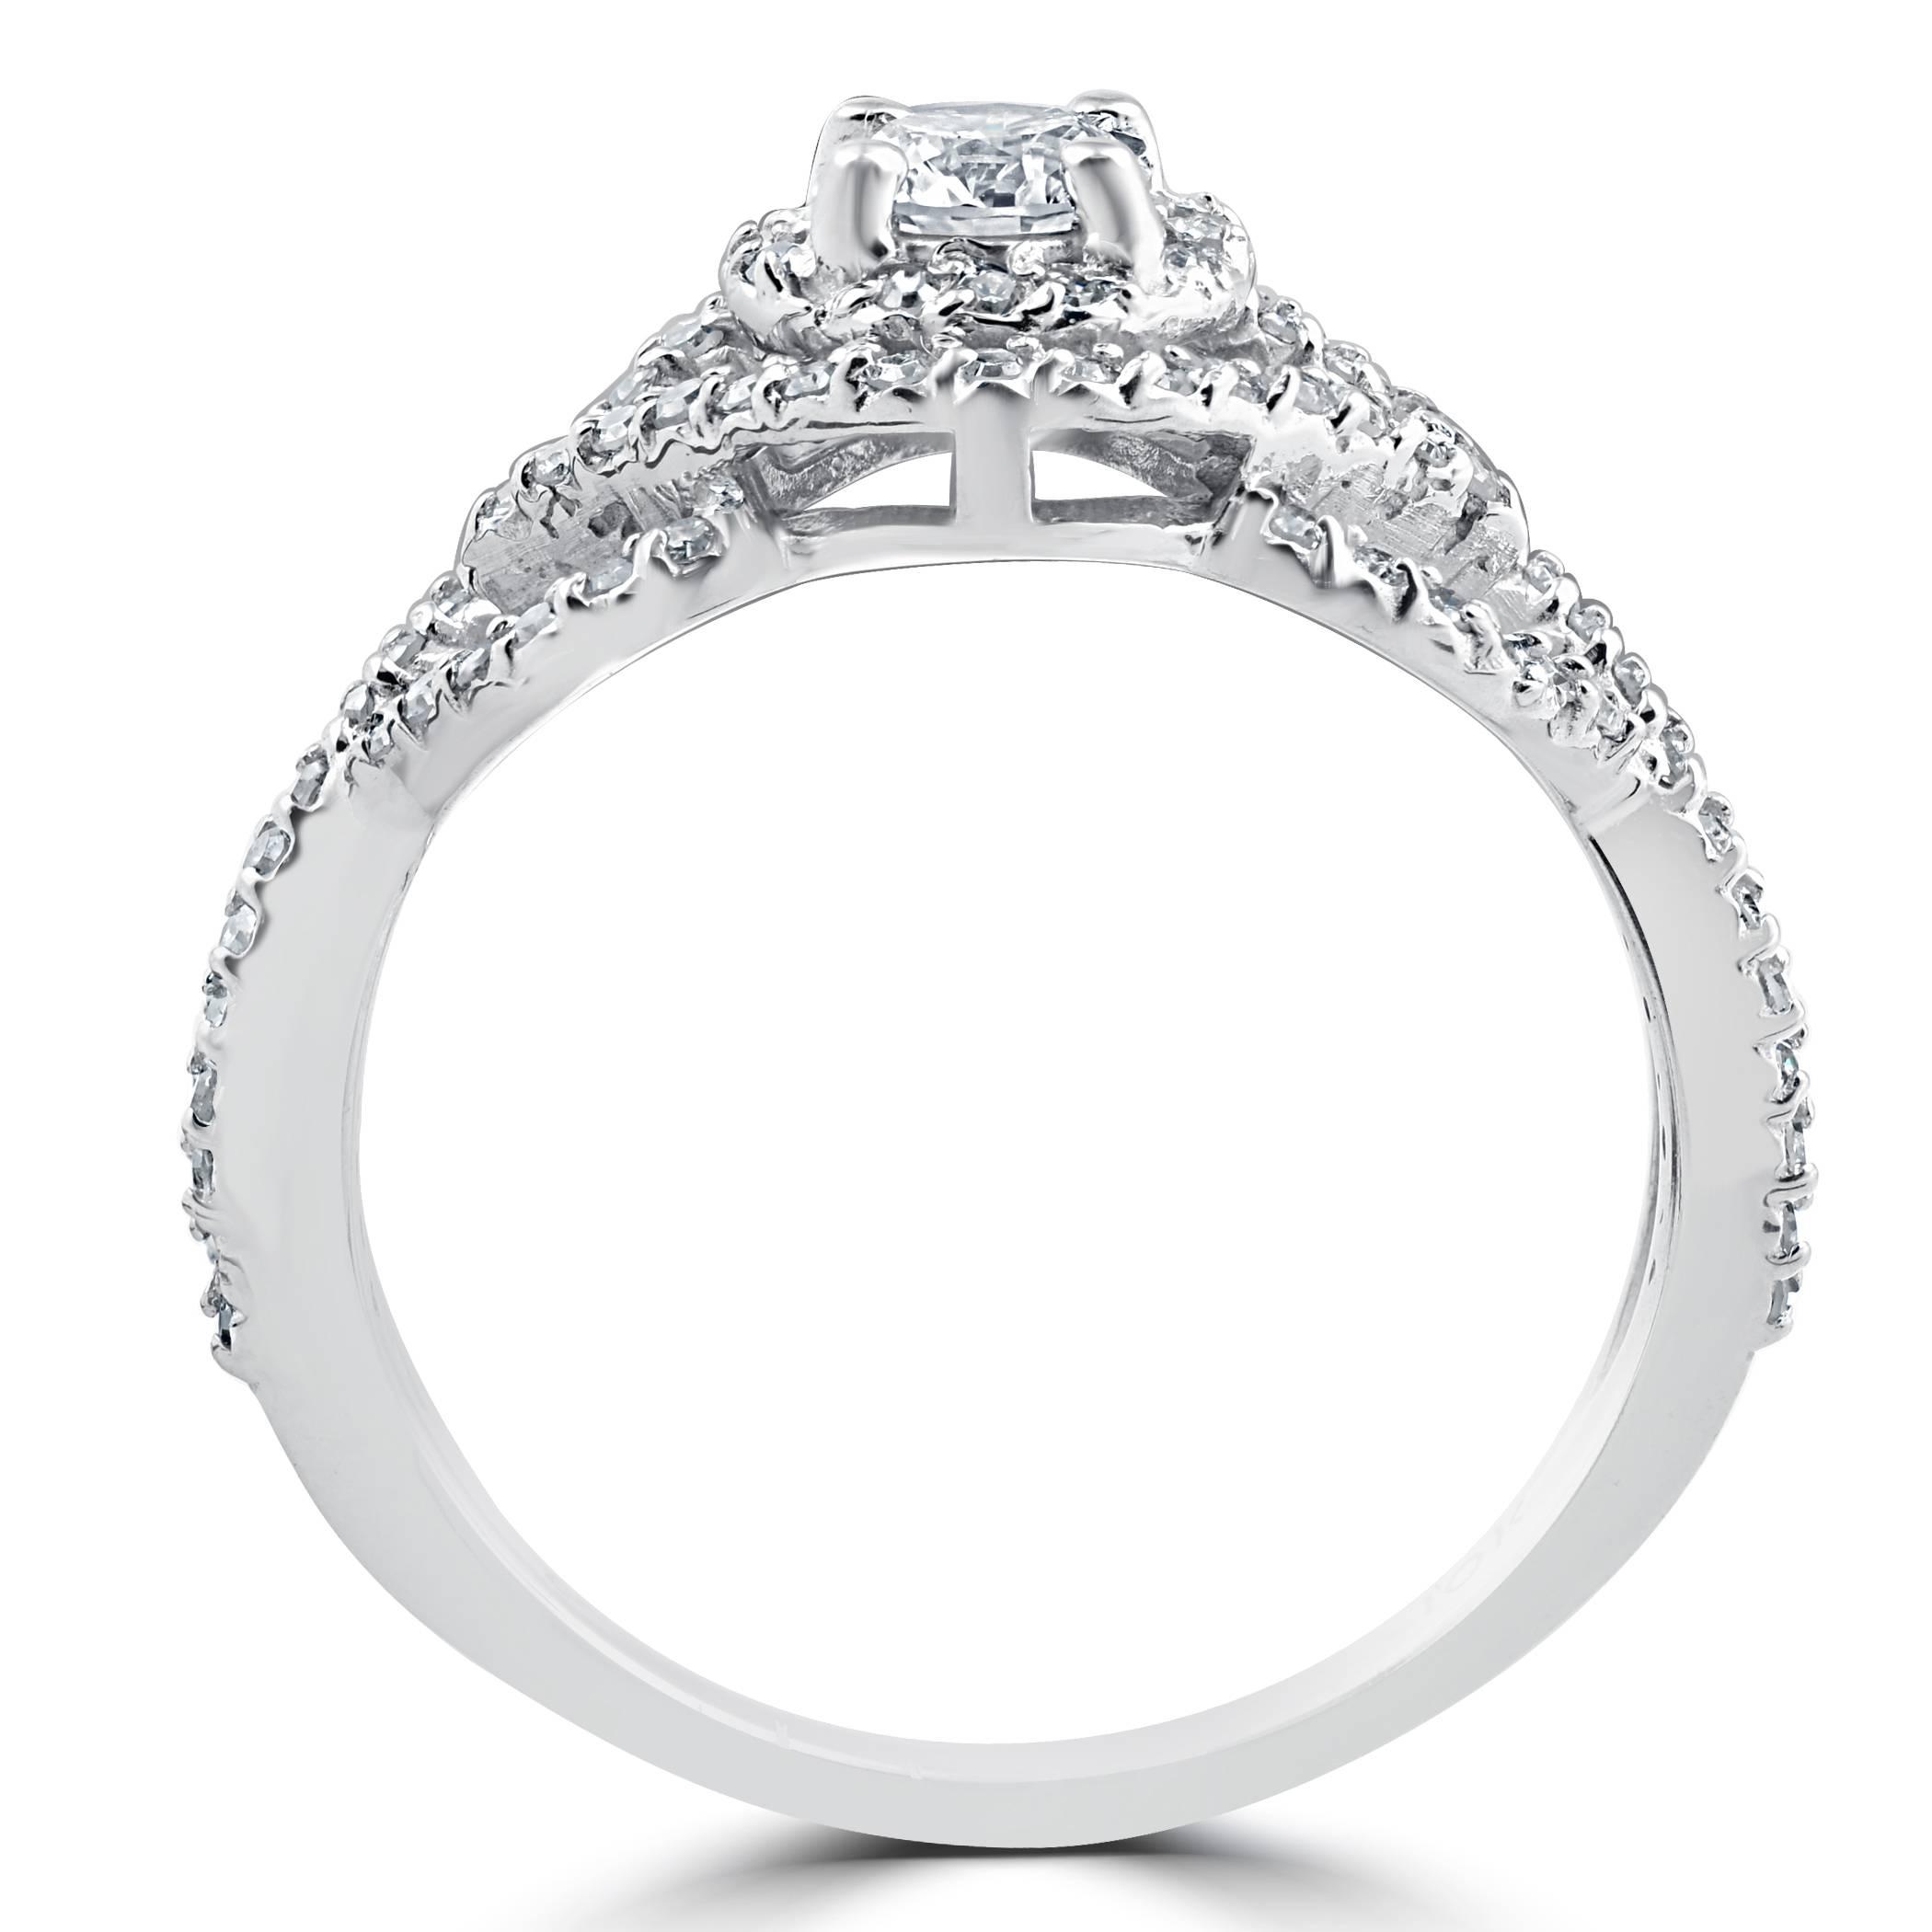 Matching Diamond Engagement And Wedding Ring 1 46ct: 1 Ct Diamond Intertwined Engagement Matching Wedding Ring